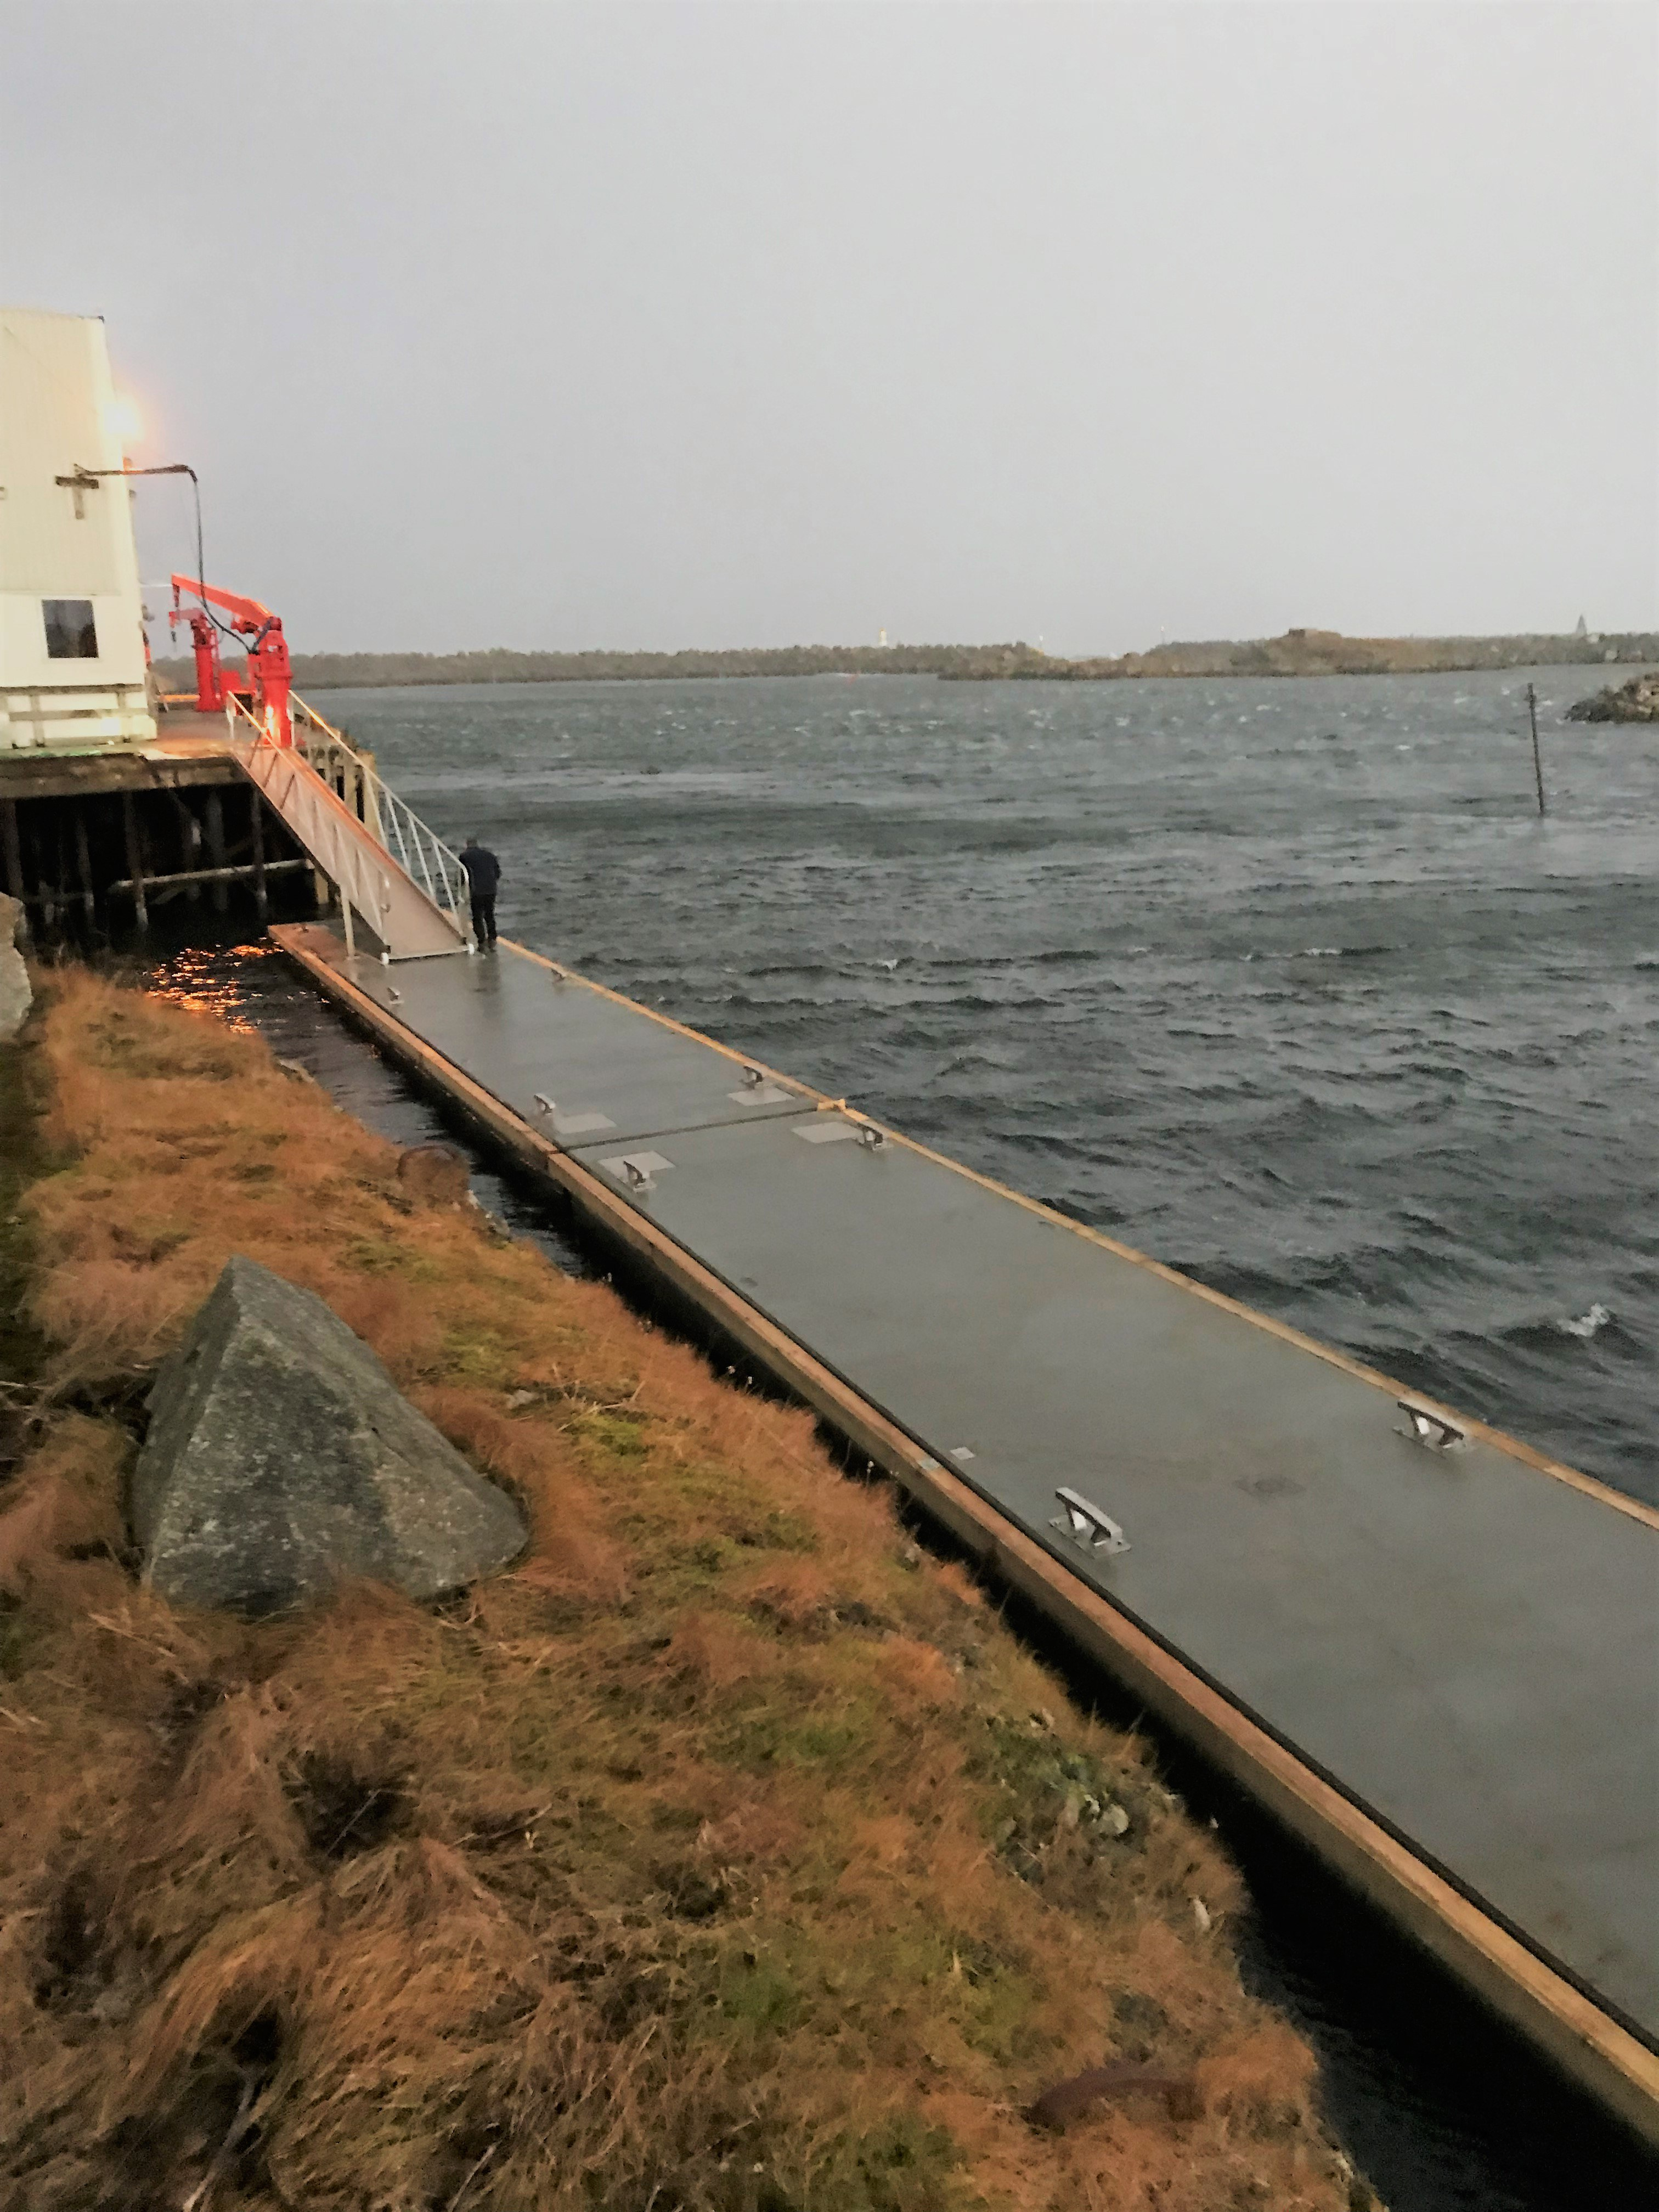 https://marinasolutions.no/uploads/Jangaard-Export-Andenes-Marina-Solutions-Brygge-6.jpg